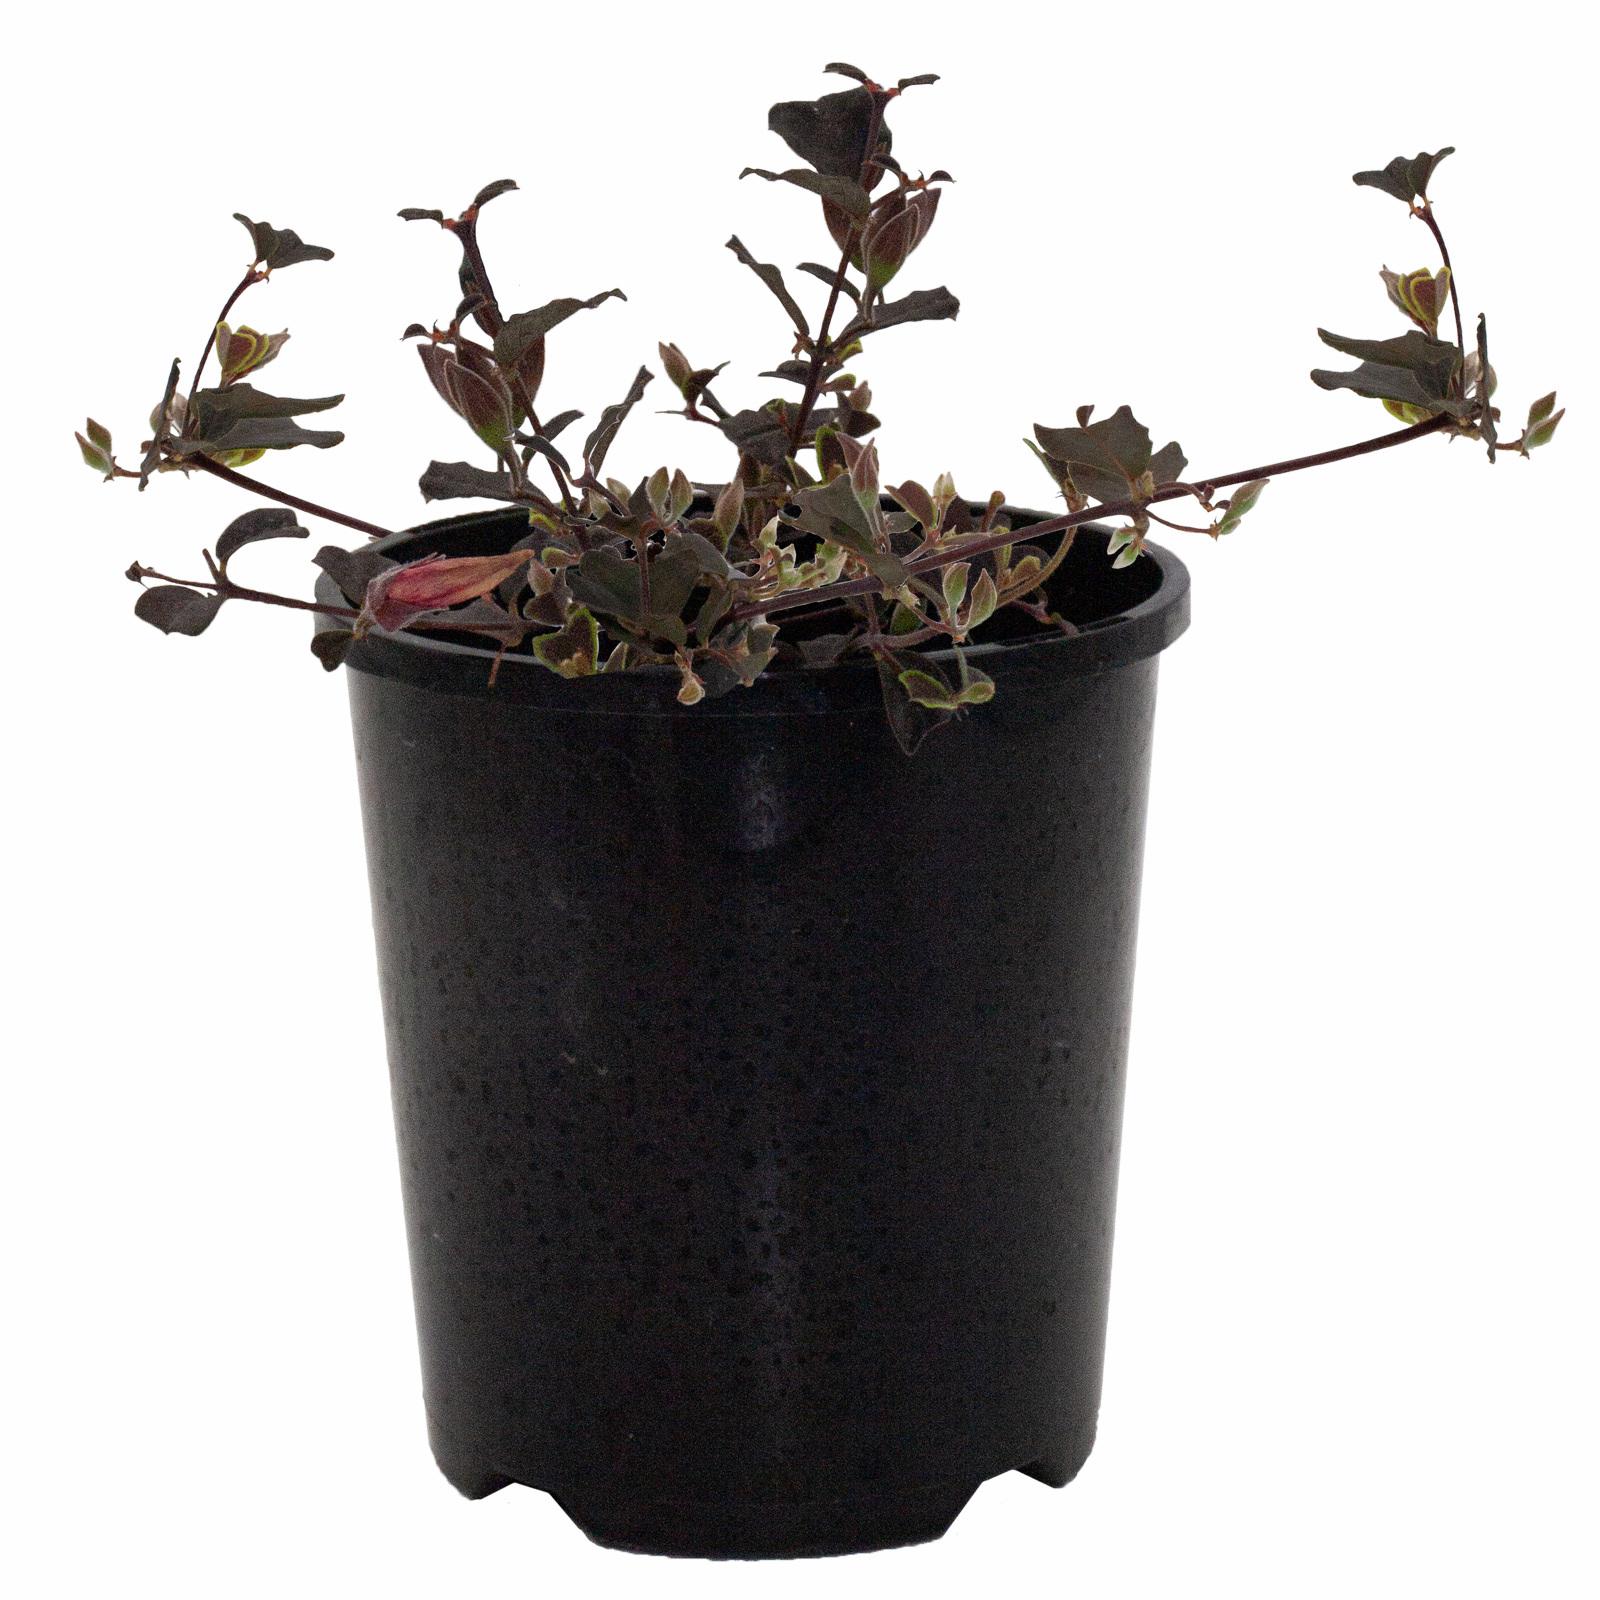 140mm Gastrolobium Praemorsum - Gastrolobium praemorsum syn. Bracysema praemorsum